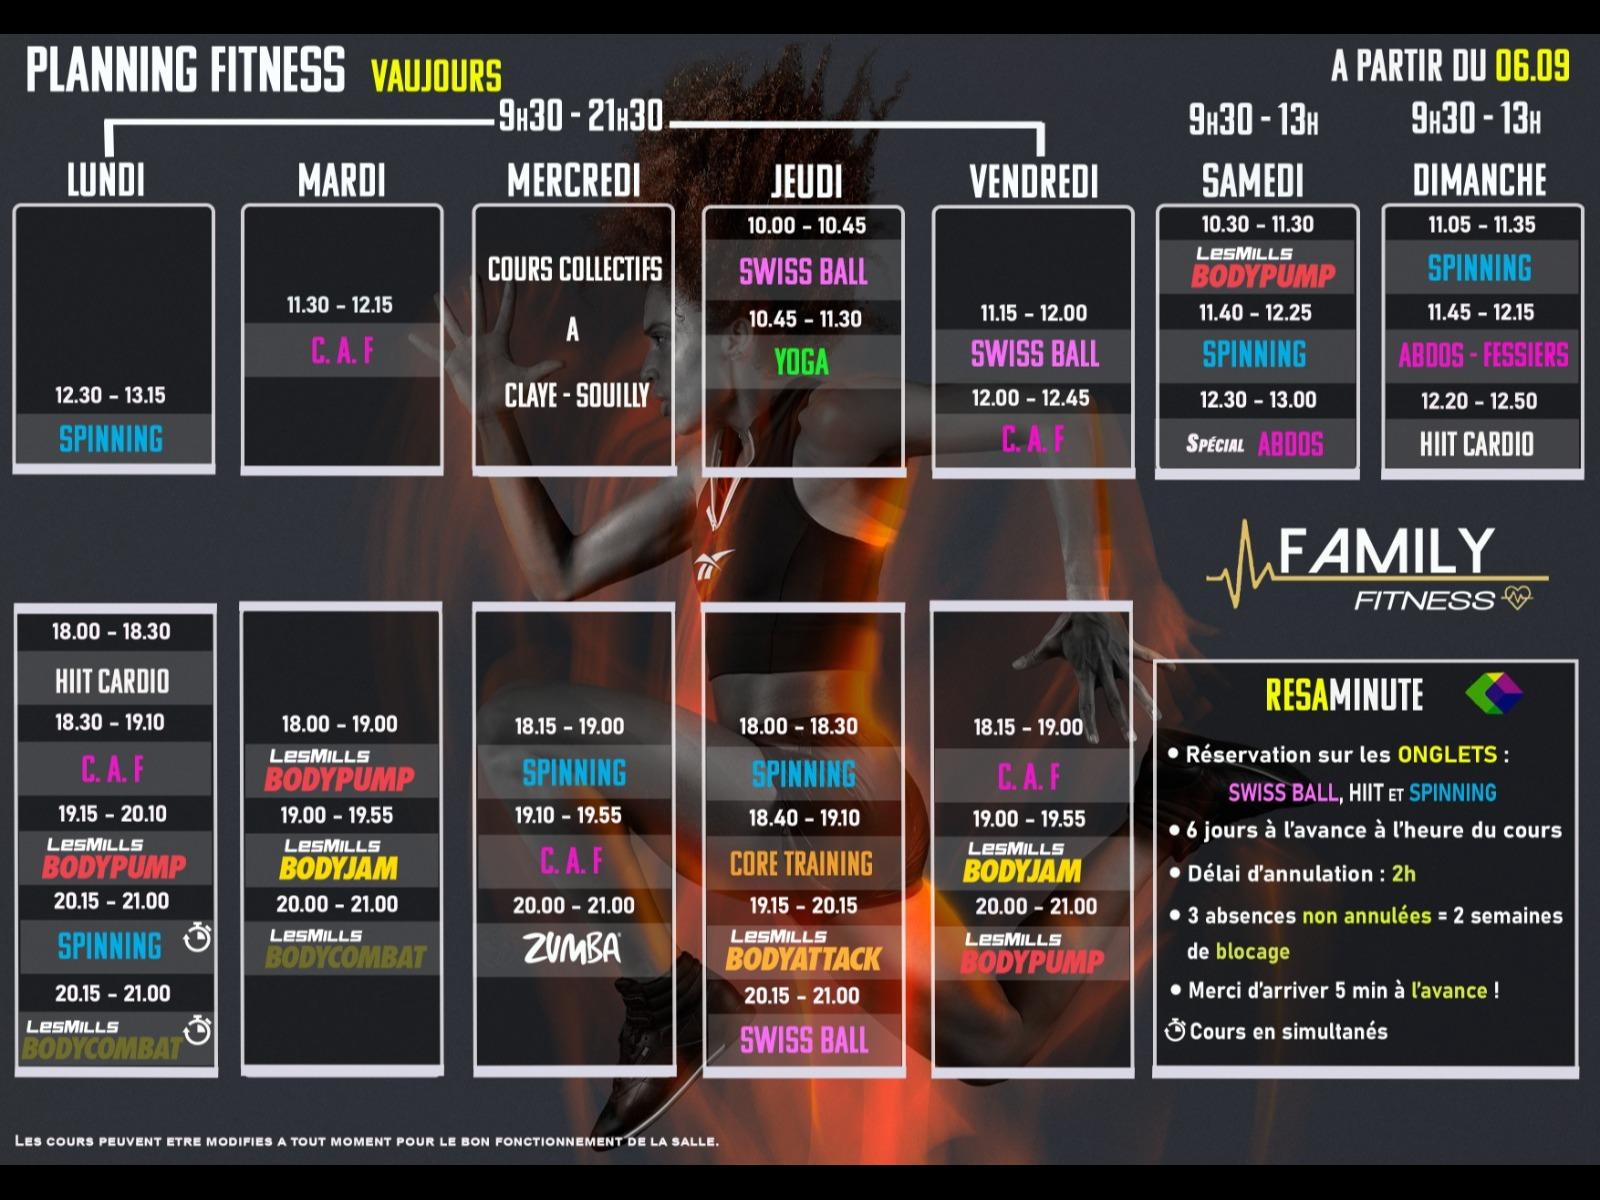 Family Fitness Vaujours